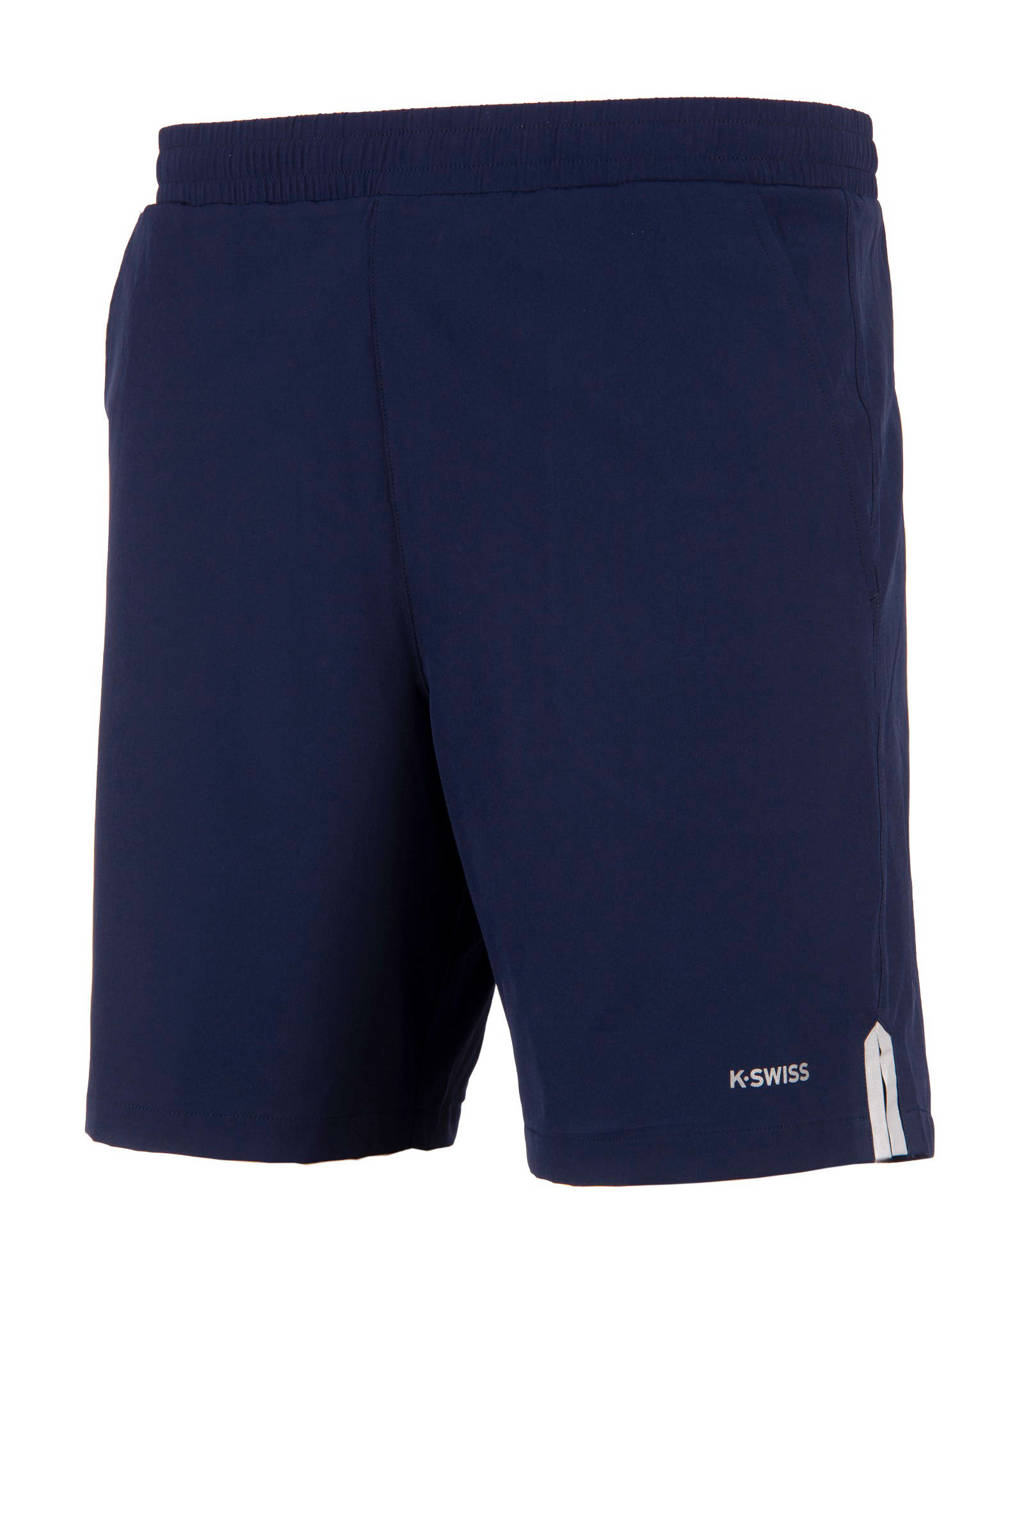 K-Swiss   sportshort donkerblauw, Donkerblauw